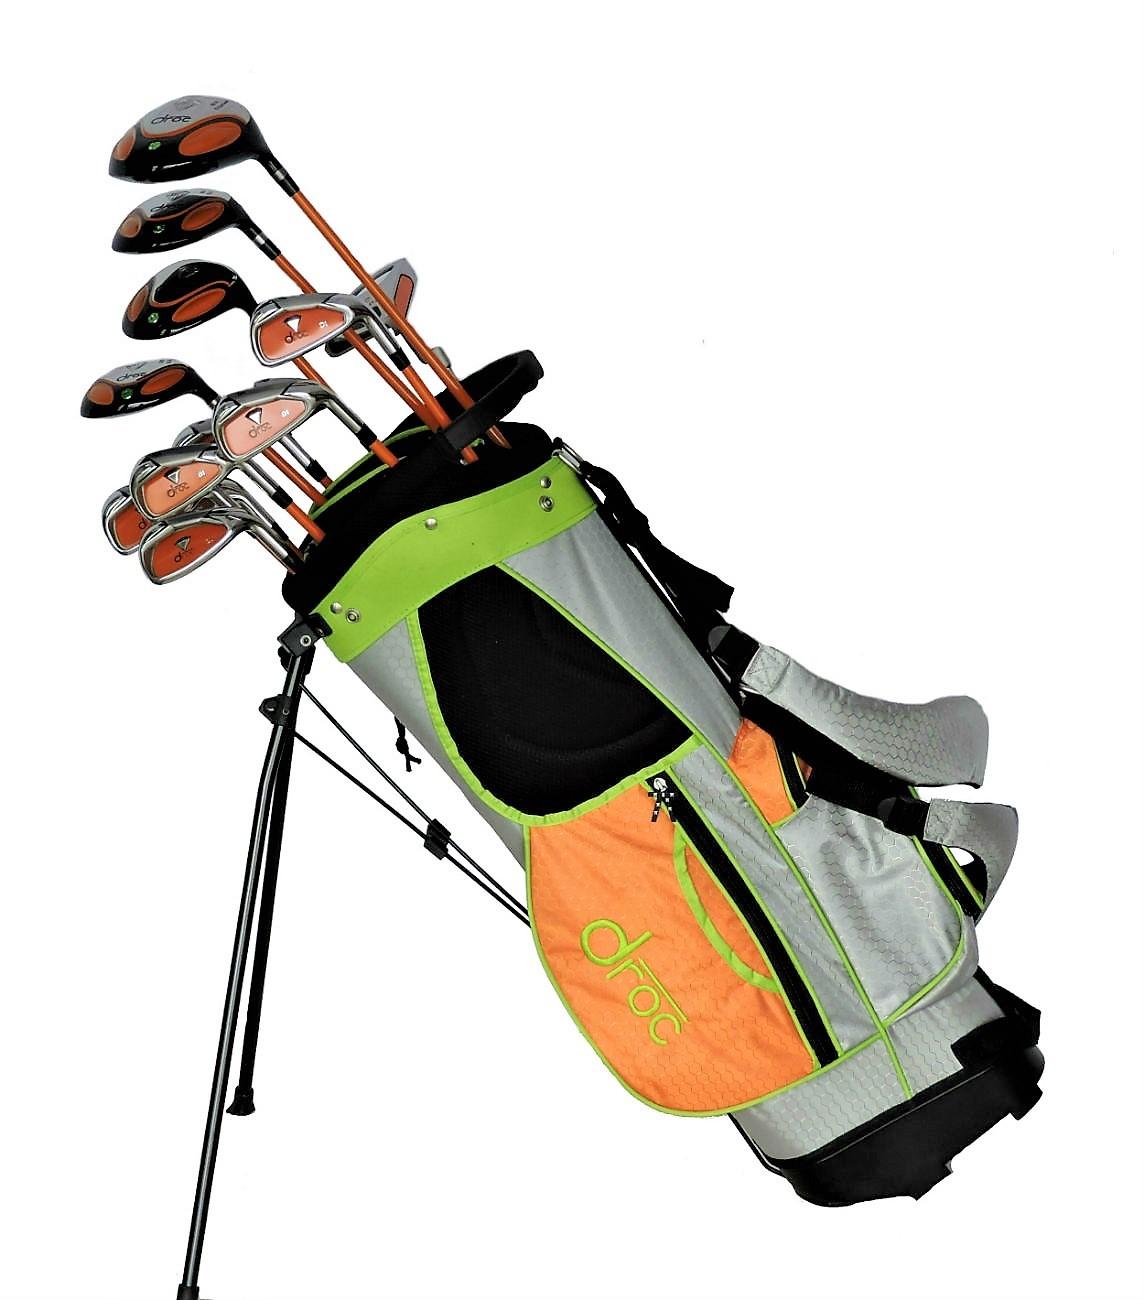 Droc Dimond Series 13 Pcs Golf Club Set Bag Age 9